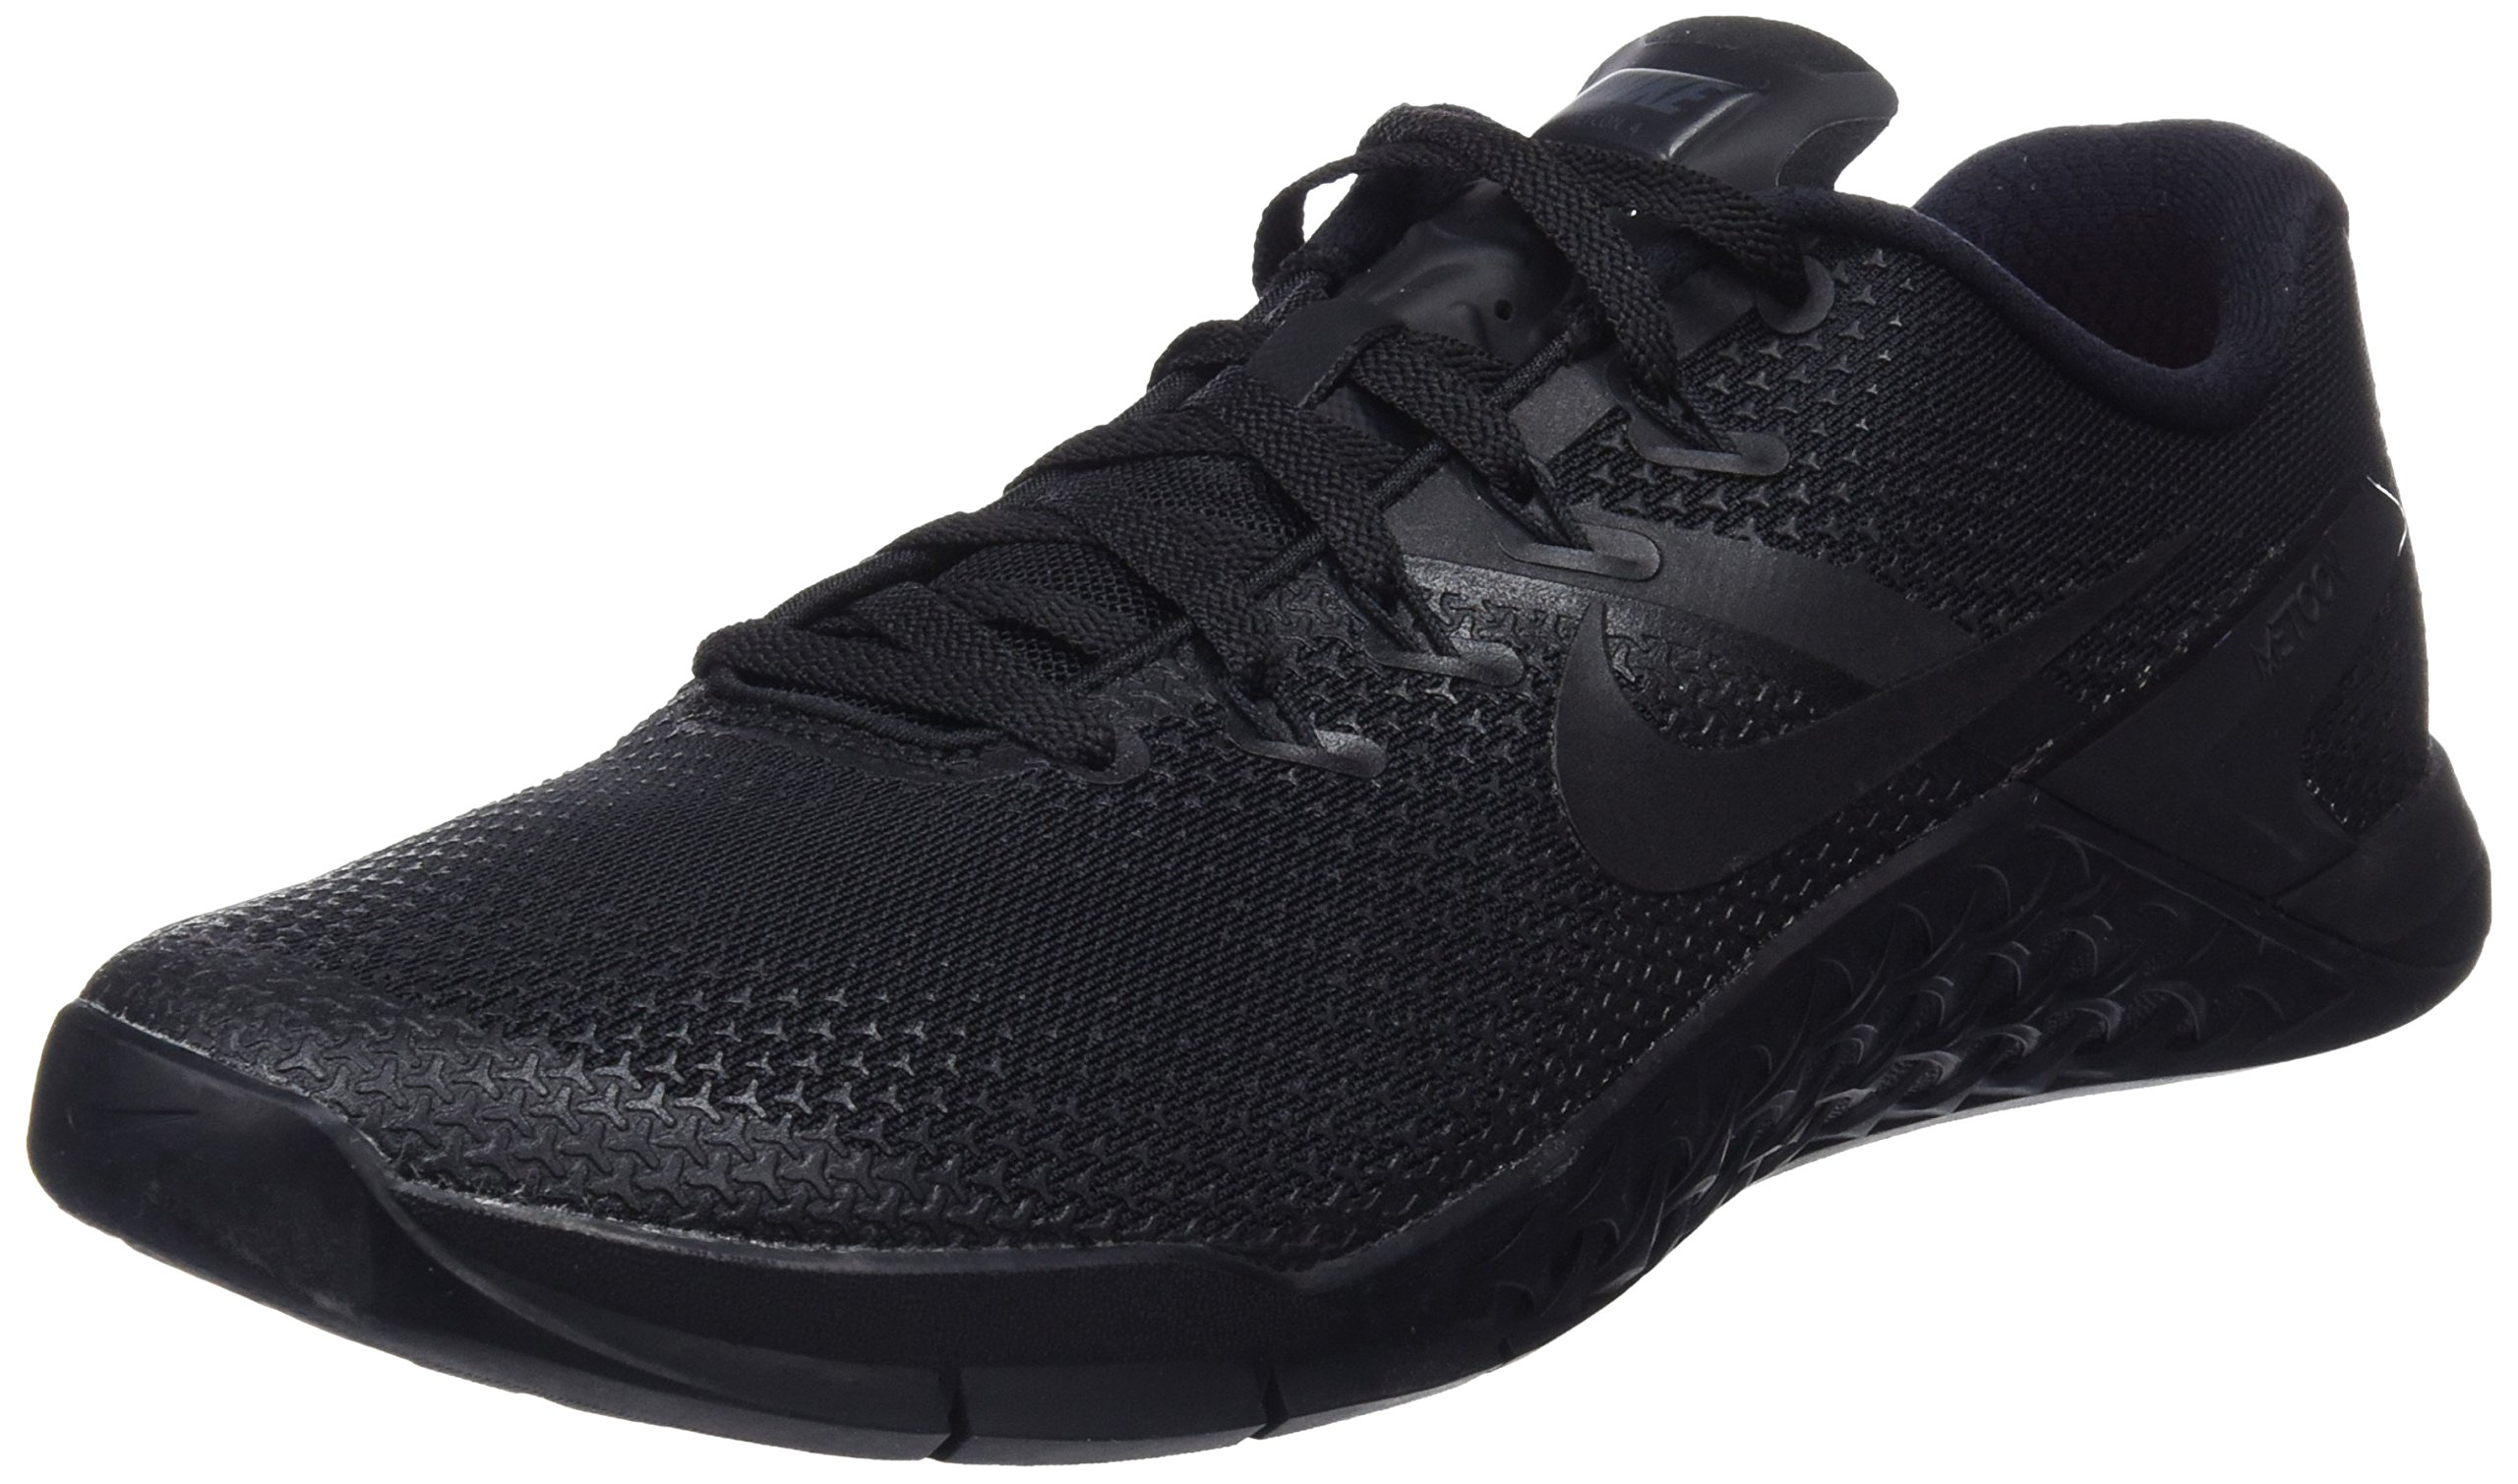 Nike Mens Metcon 4 Training Shoe AH7453-001 (6.5)